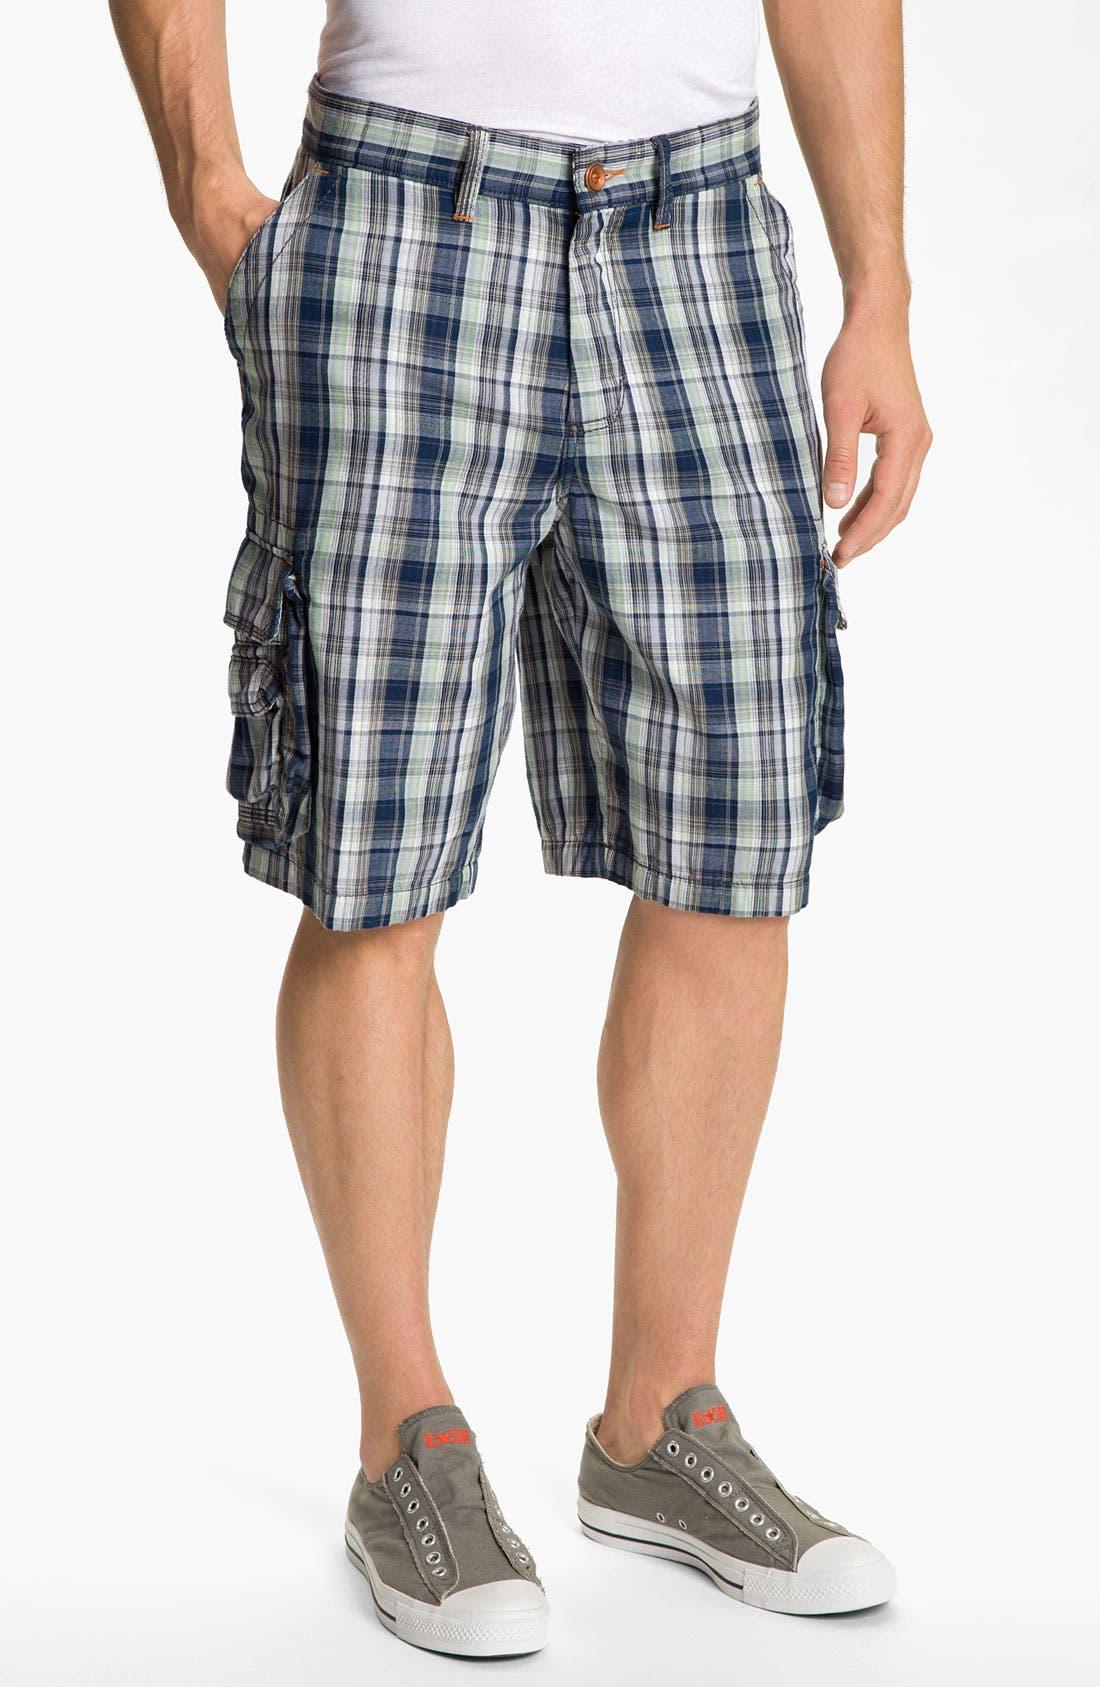 Alternate Image 1 Selected - Tommy Bahama 'Charter' Cargo Shorts